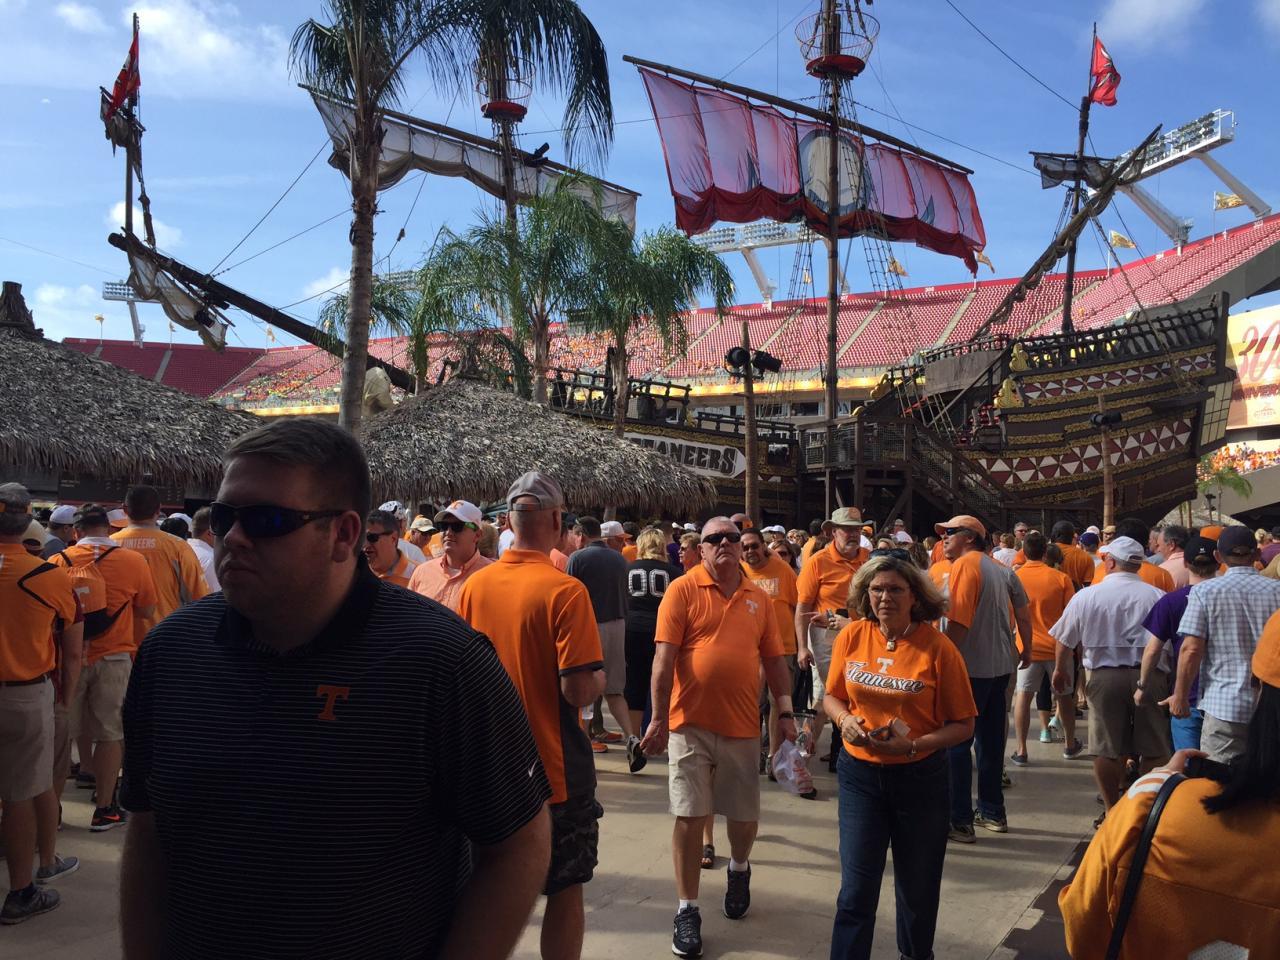 Ship in Raymond James stadium